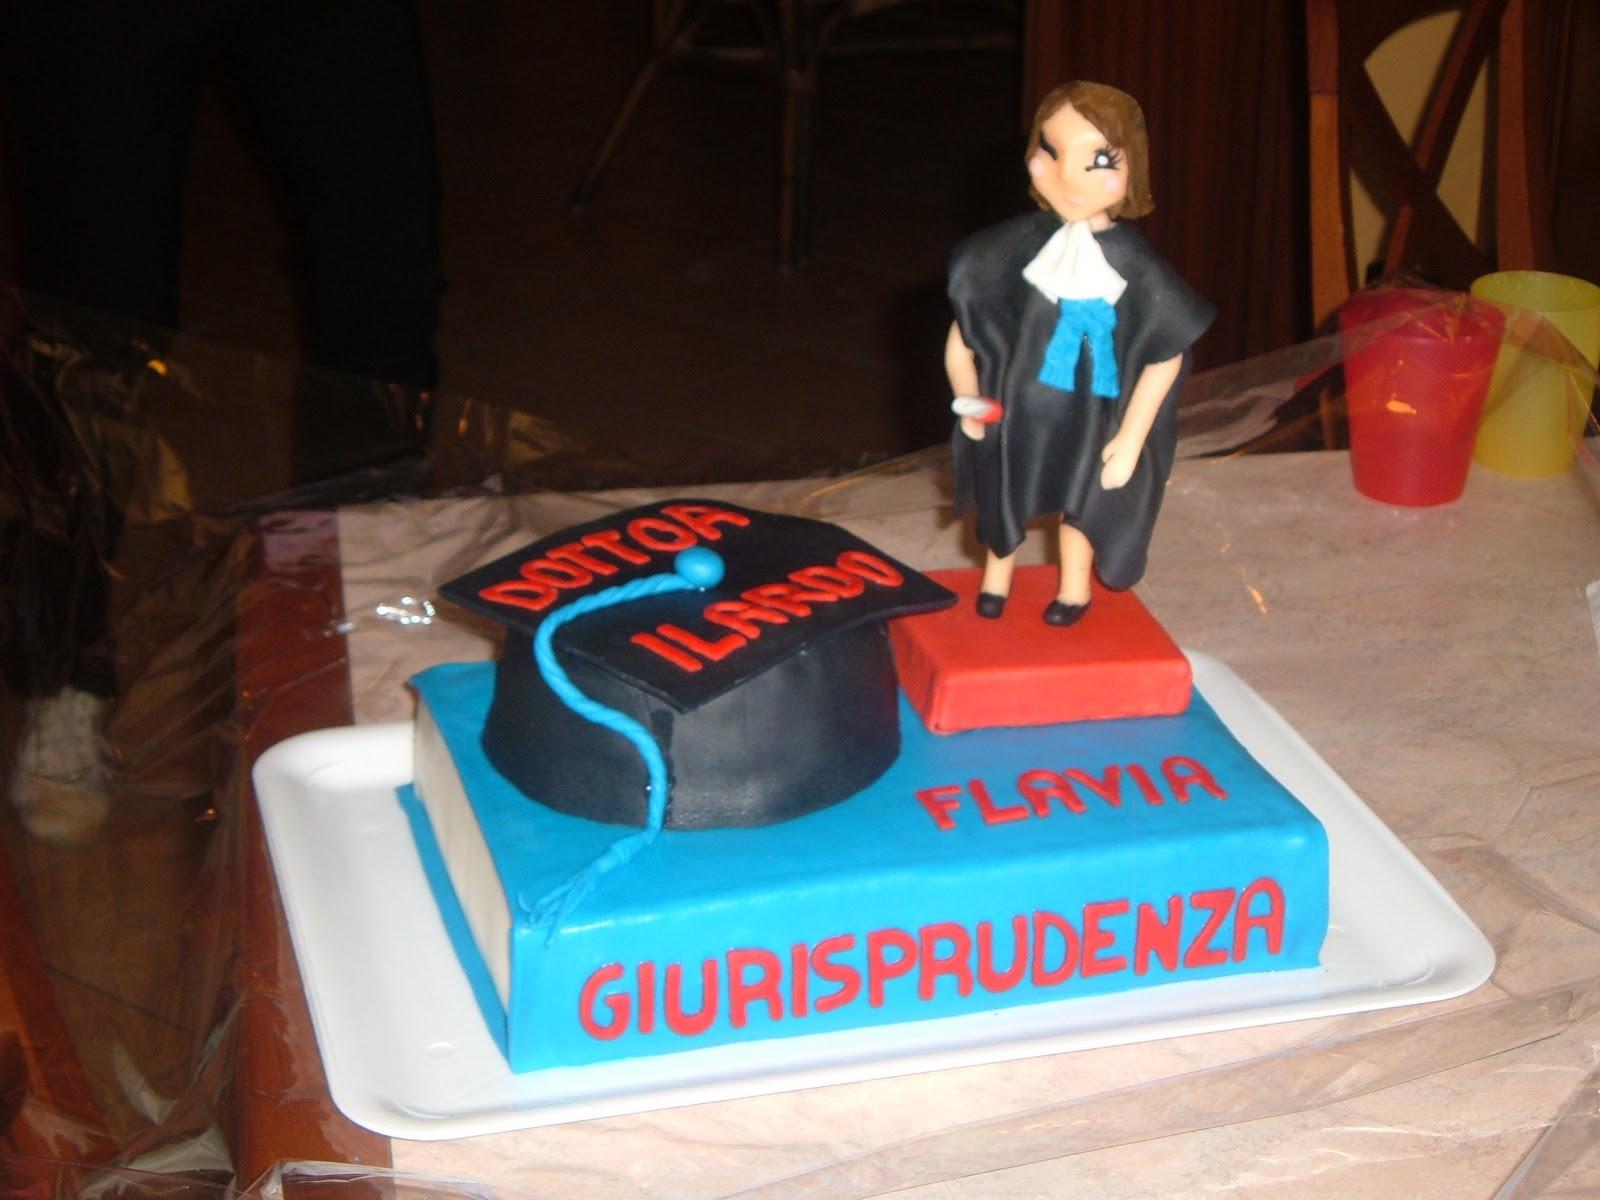 Popolare Tutti Pazzi x La PdZ (Pasta di Zucchero): Torta Laurea Giurisprudenza JS64